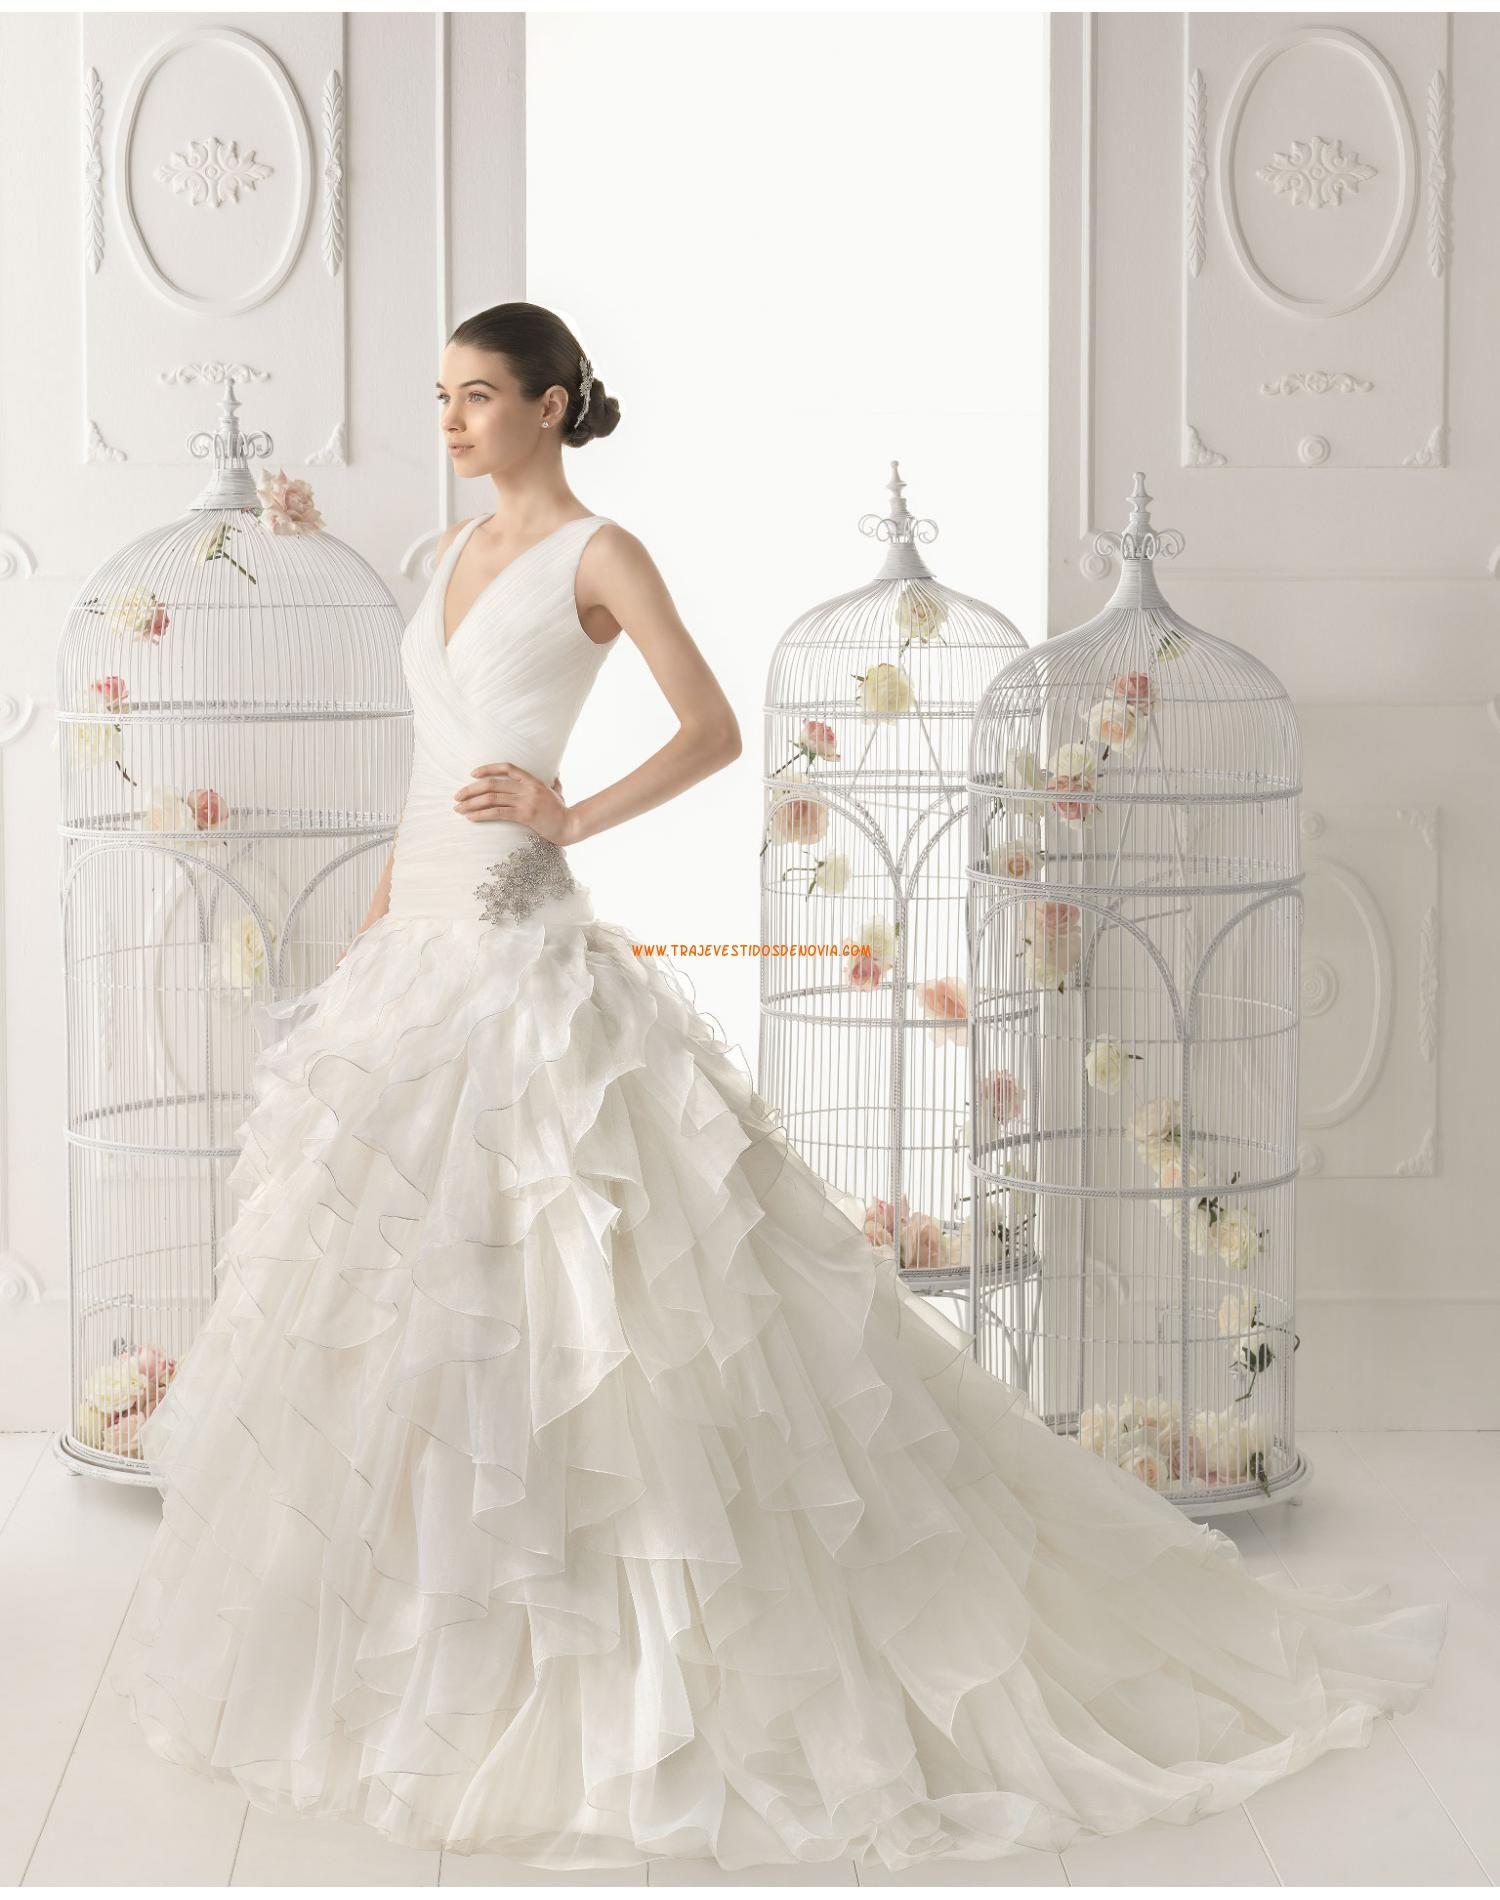 Escote v traje de novia de organza múltiples capas 2014 | vestidos ...